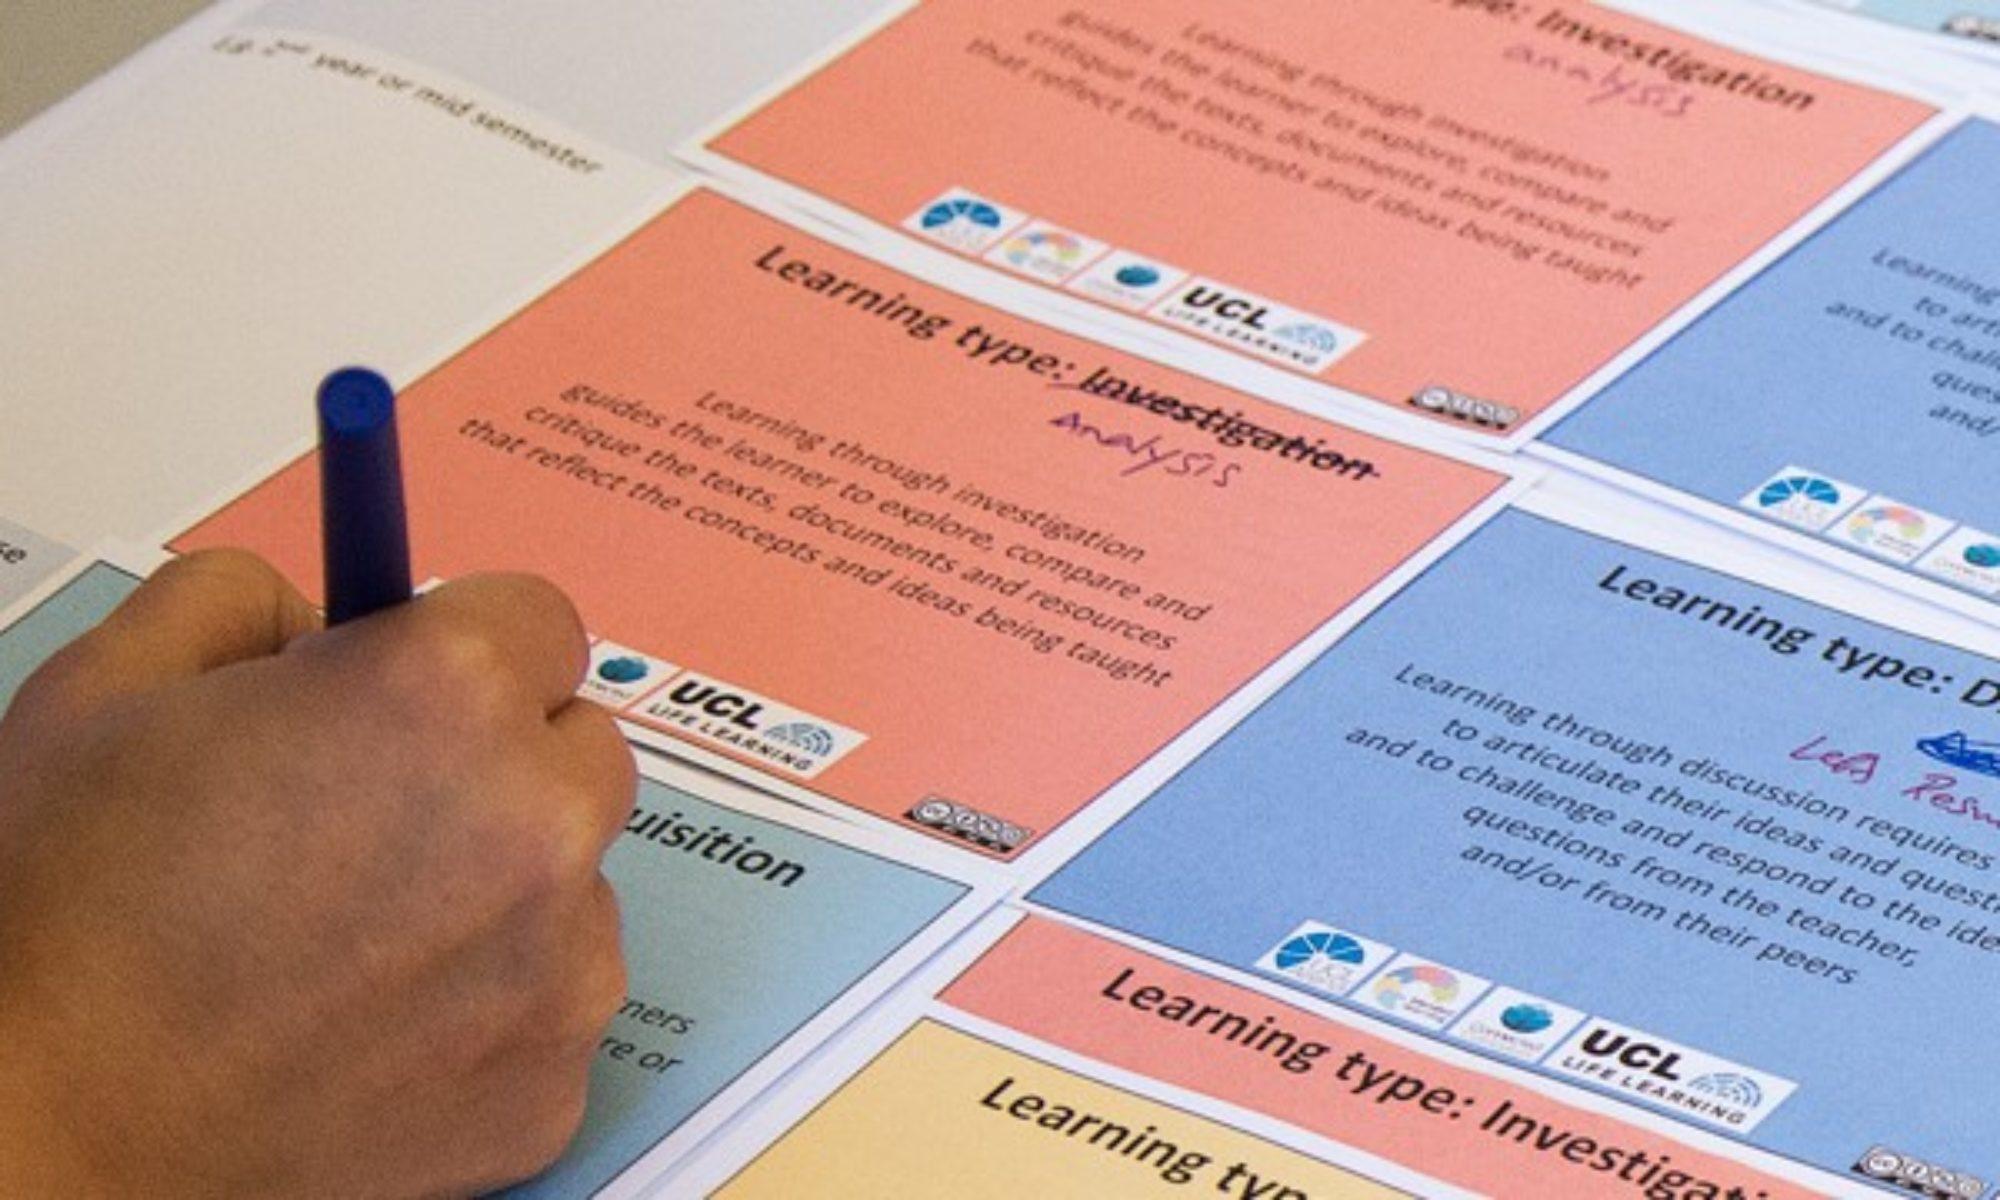 ABC Learning Design